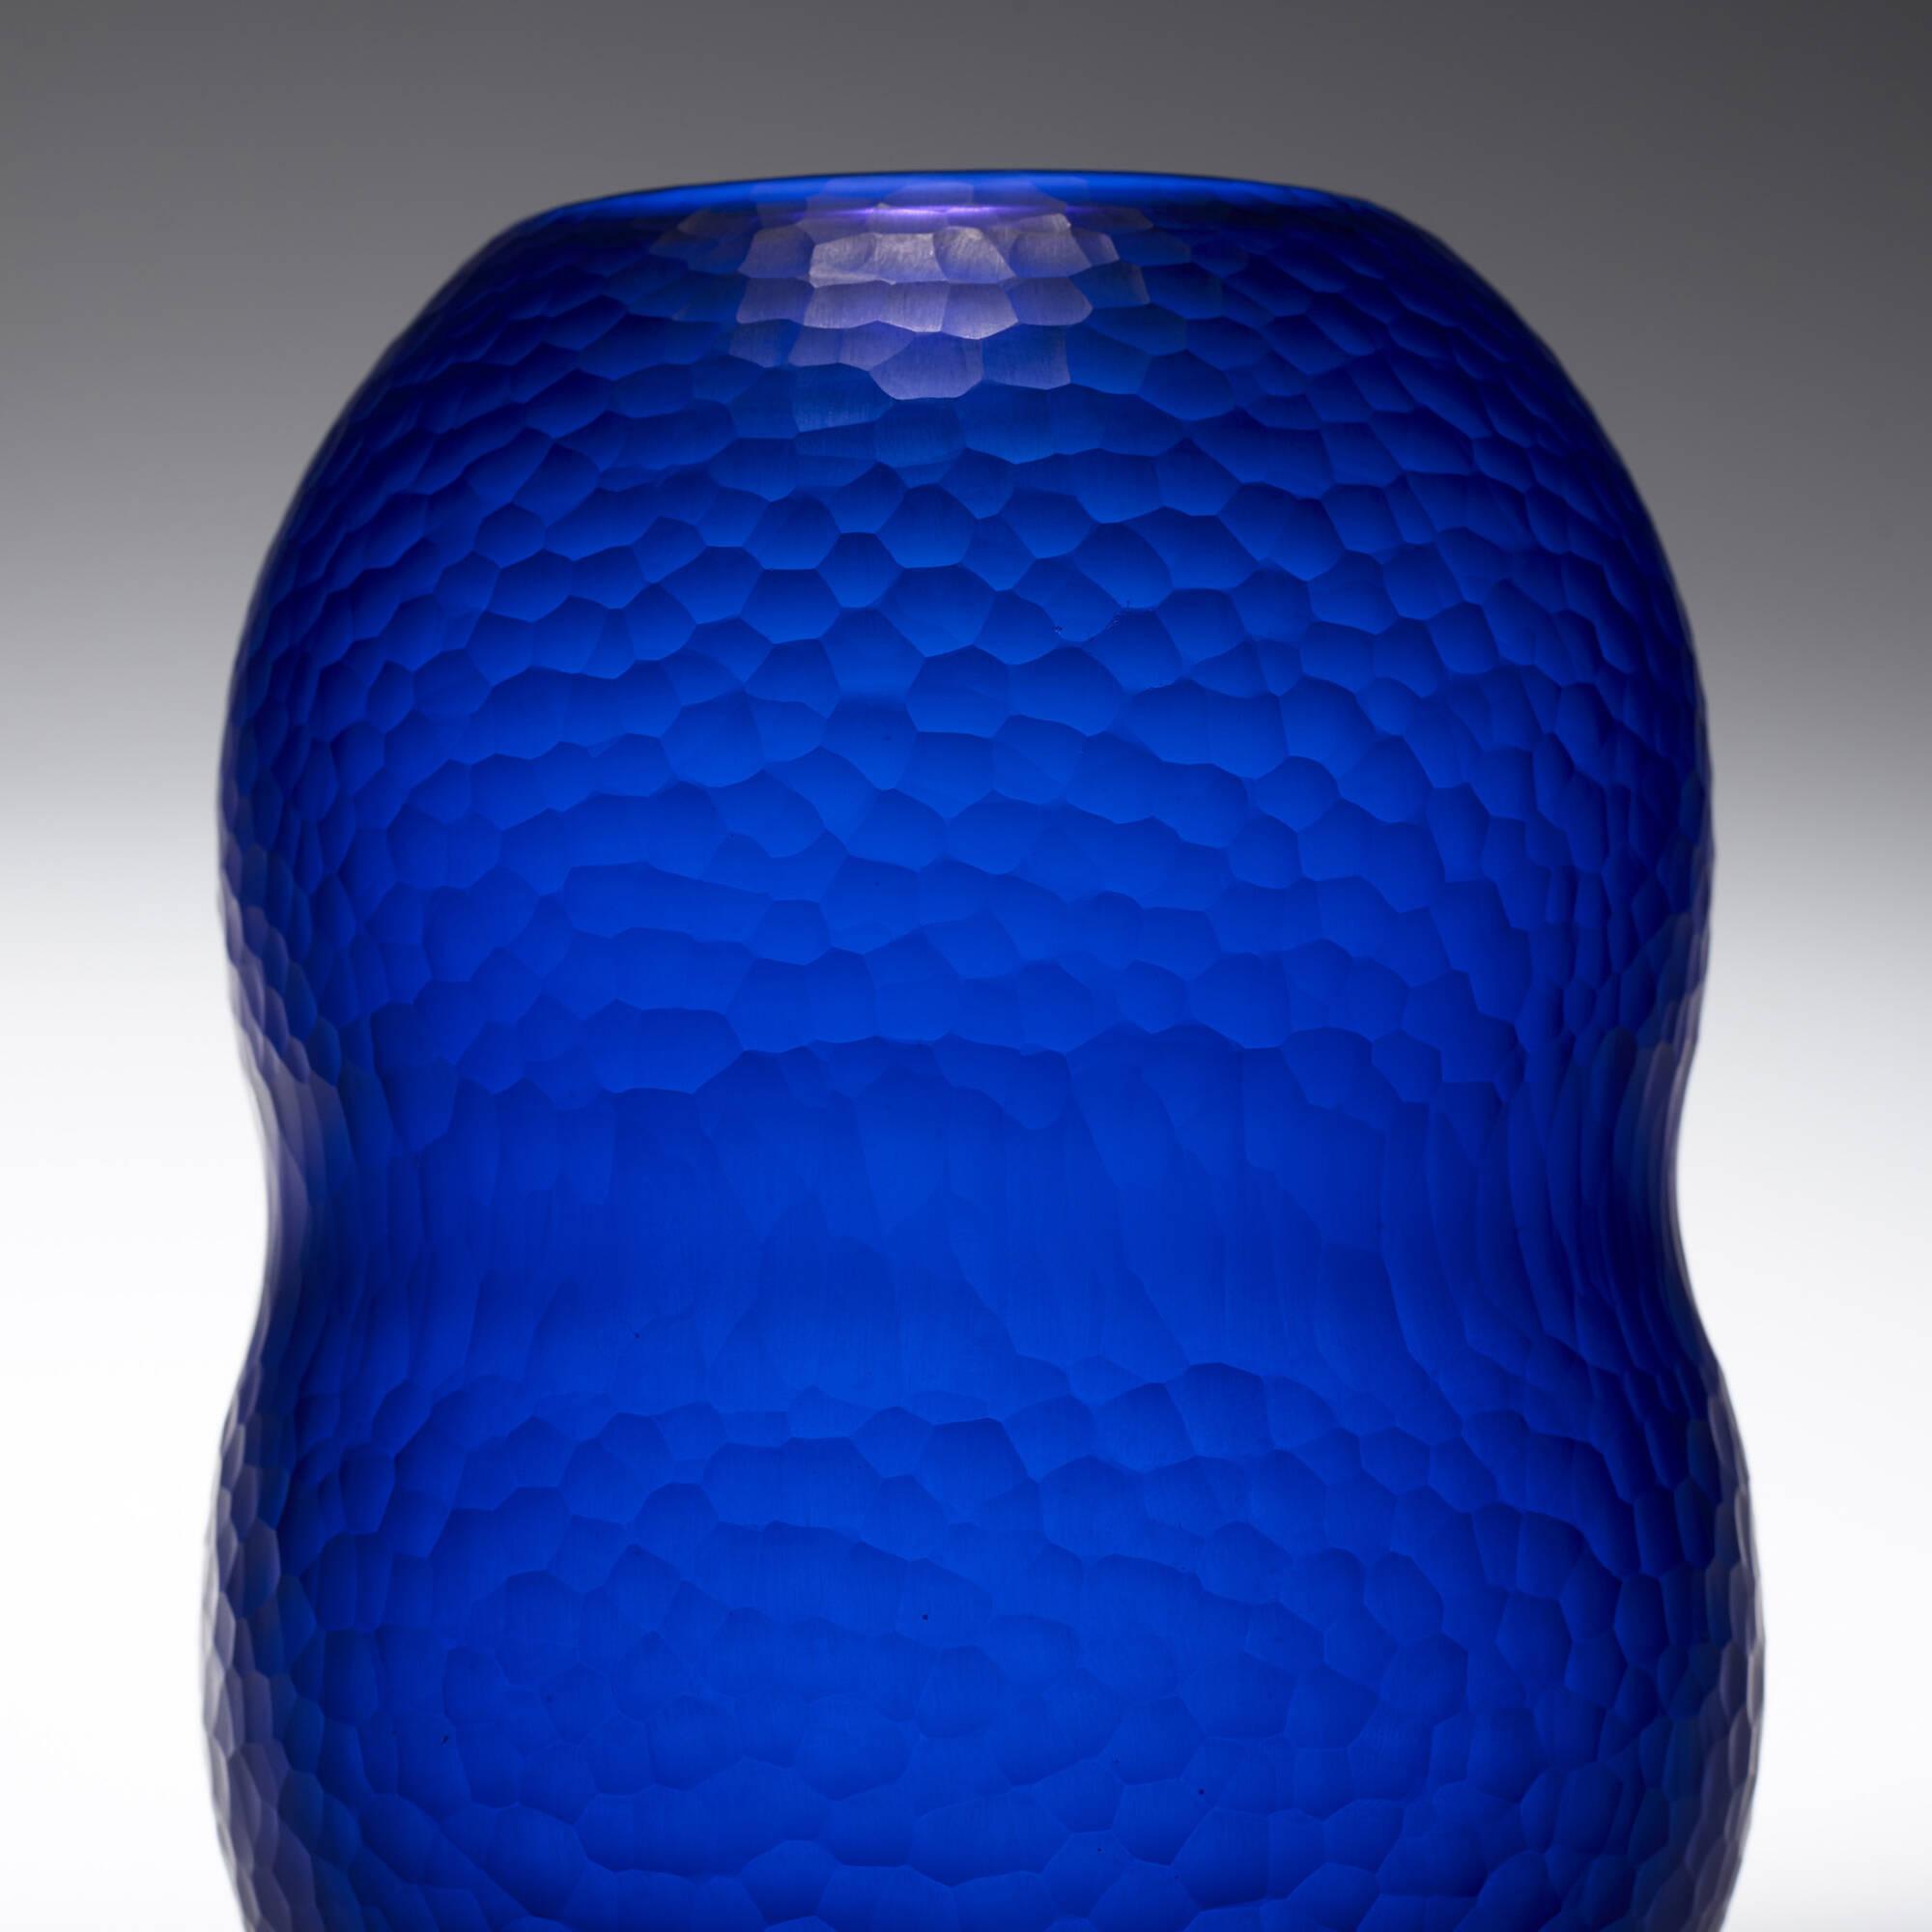 50 carlo scarpa battuto vase masterworks 25 may 2017 50 carlo scarpa battuto vase 2 of 3 floridaeventfo Image collections